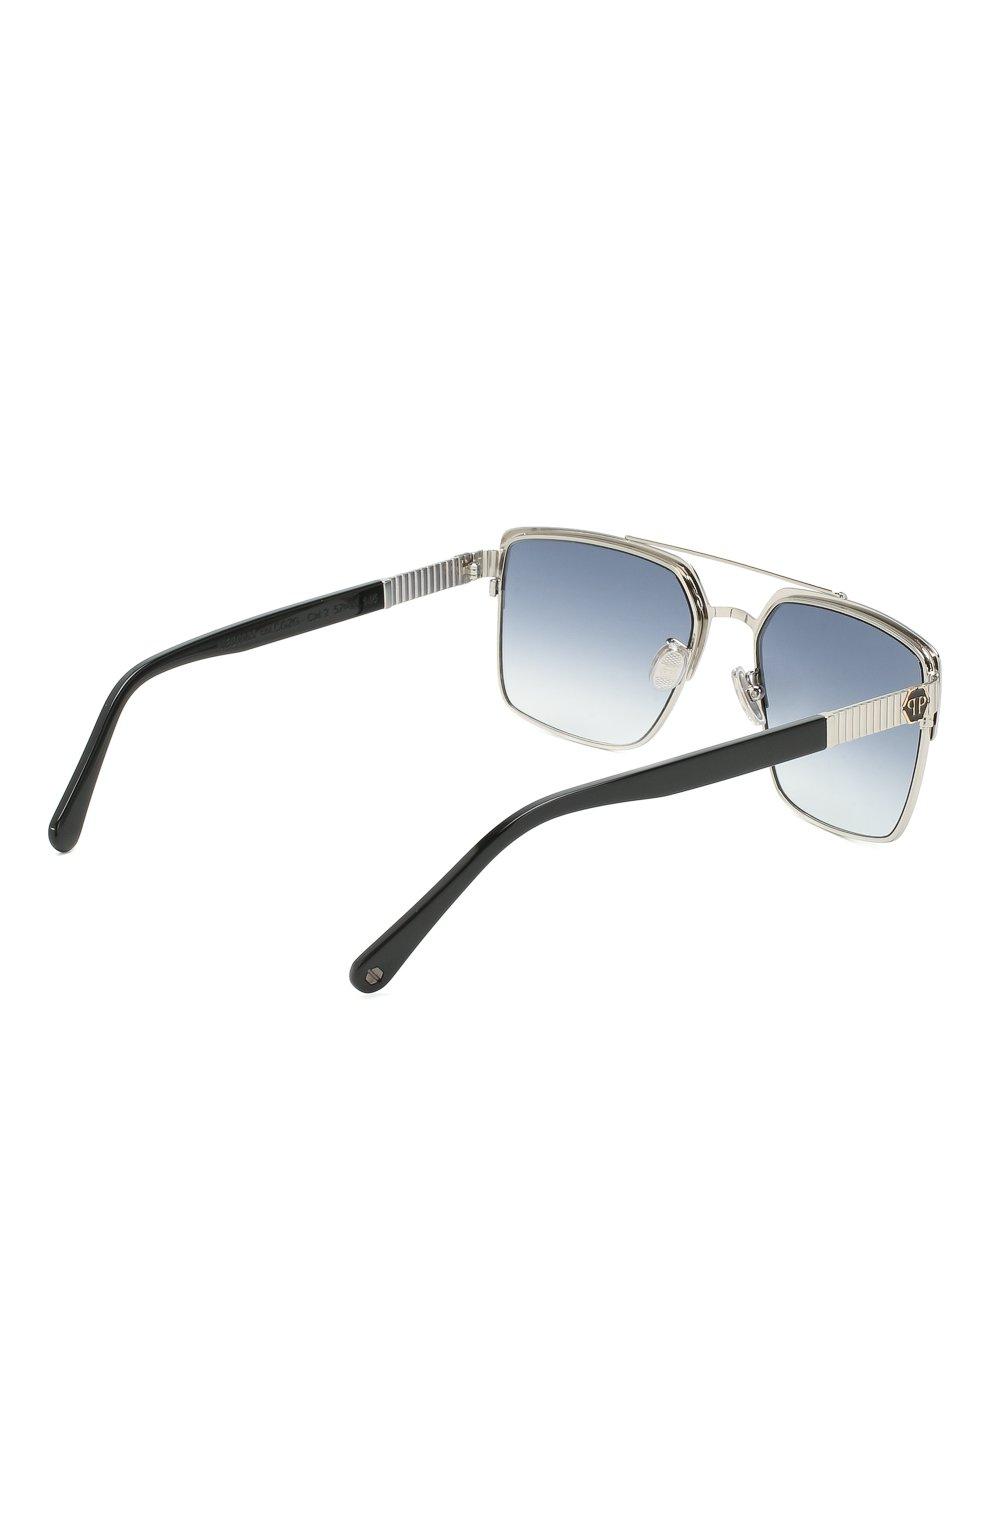 Мужские солнцезащитные очки PHILIPP PLEIN серого цвета, арт. UES0065 | Фото 3